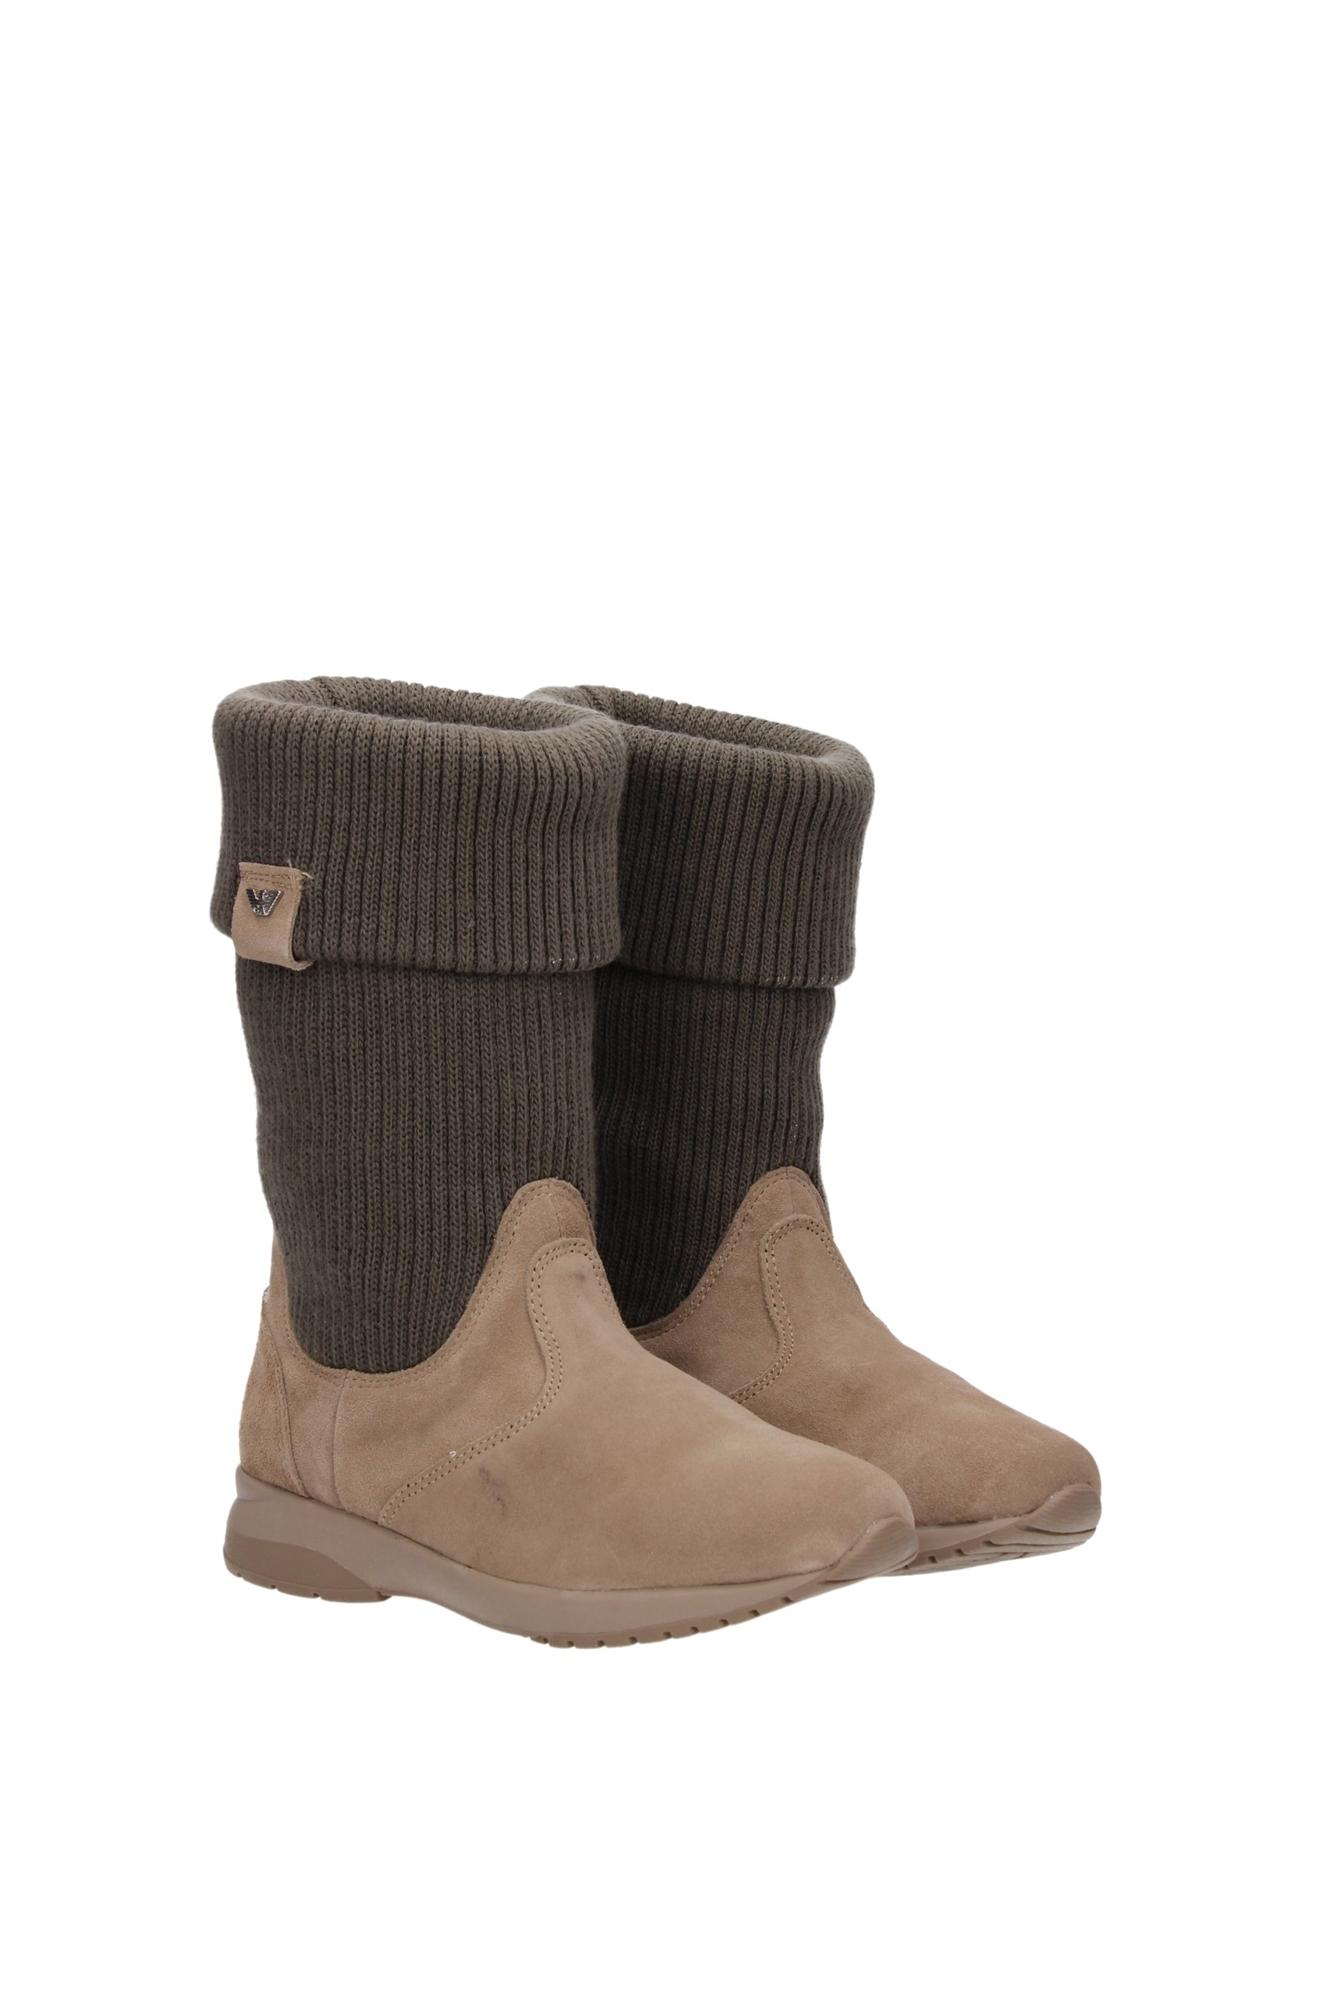 boots armani suede beige aj068225051 ebay